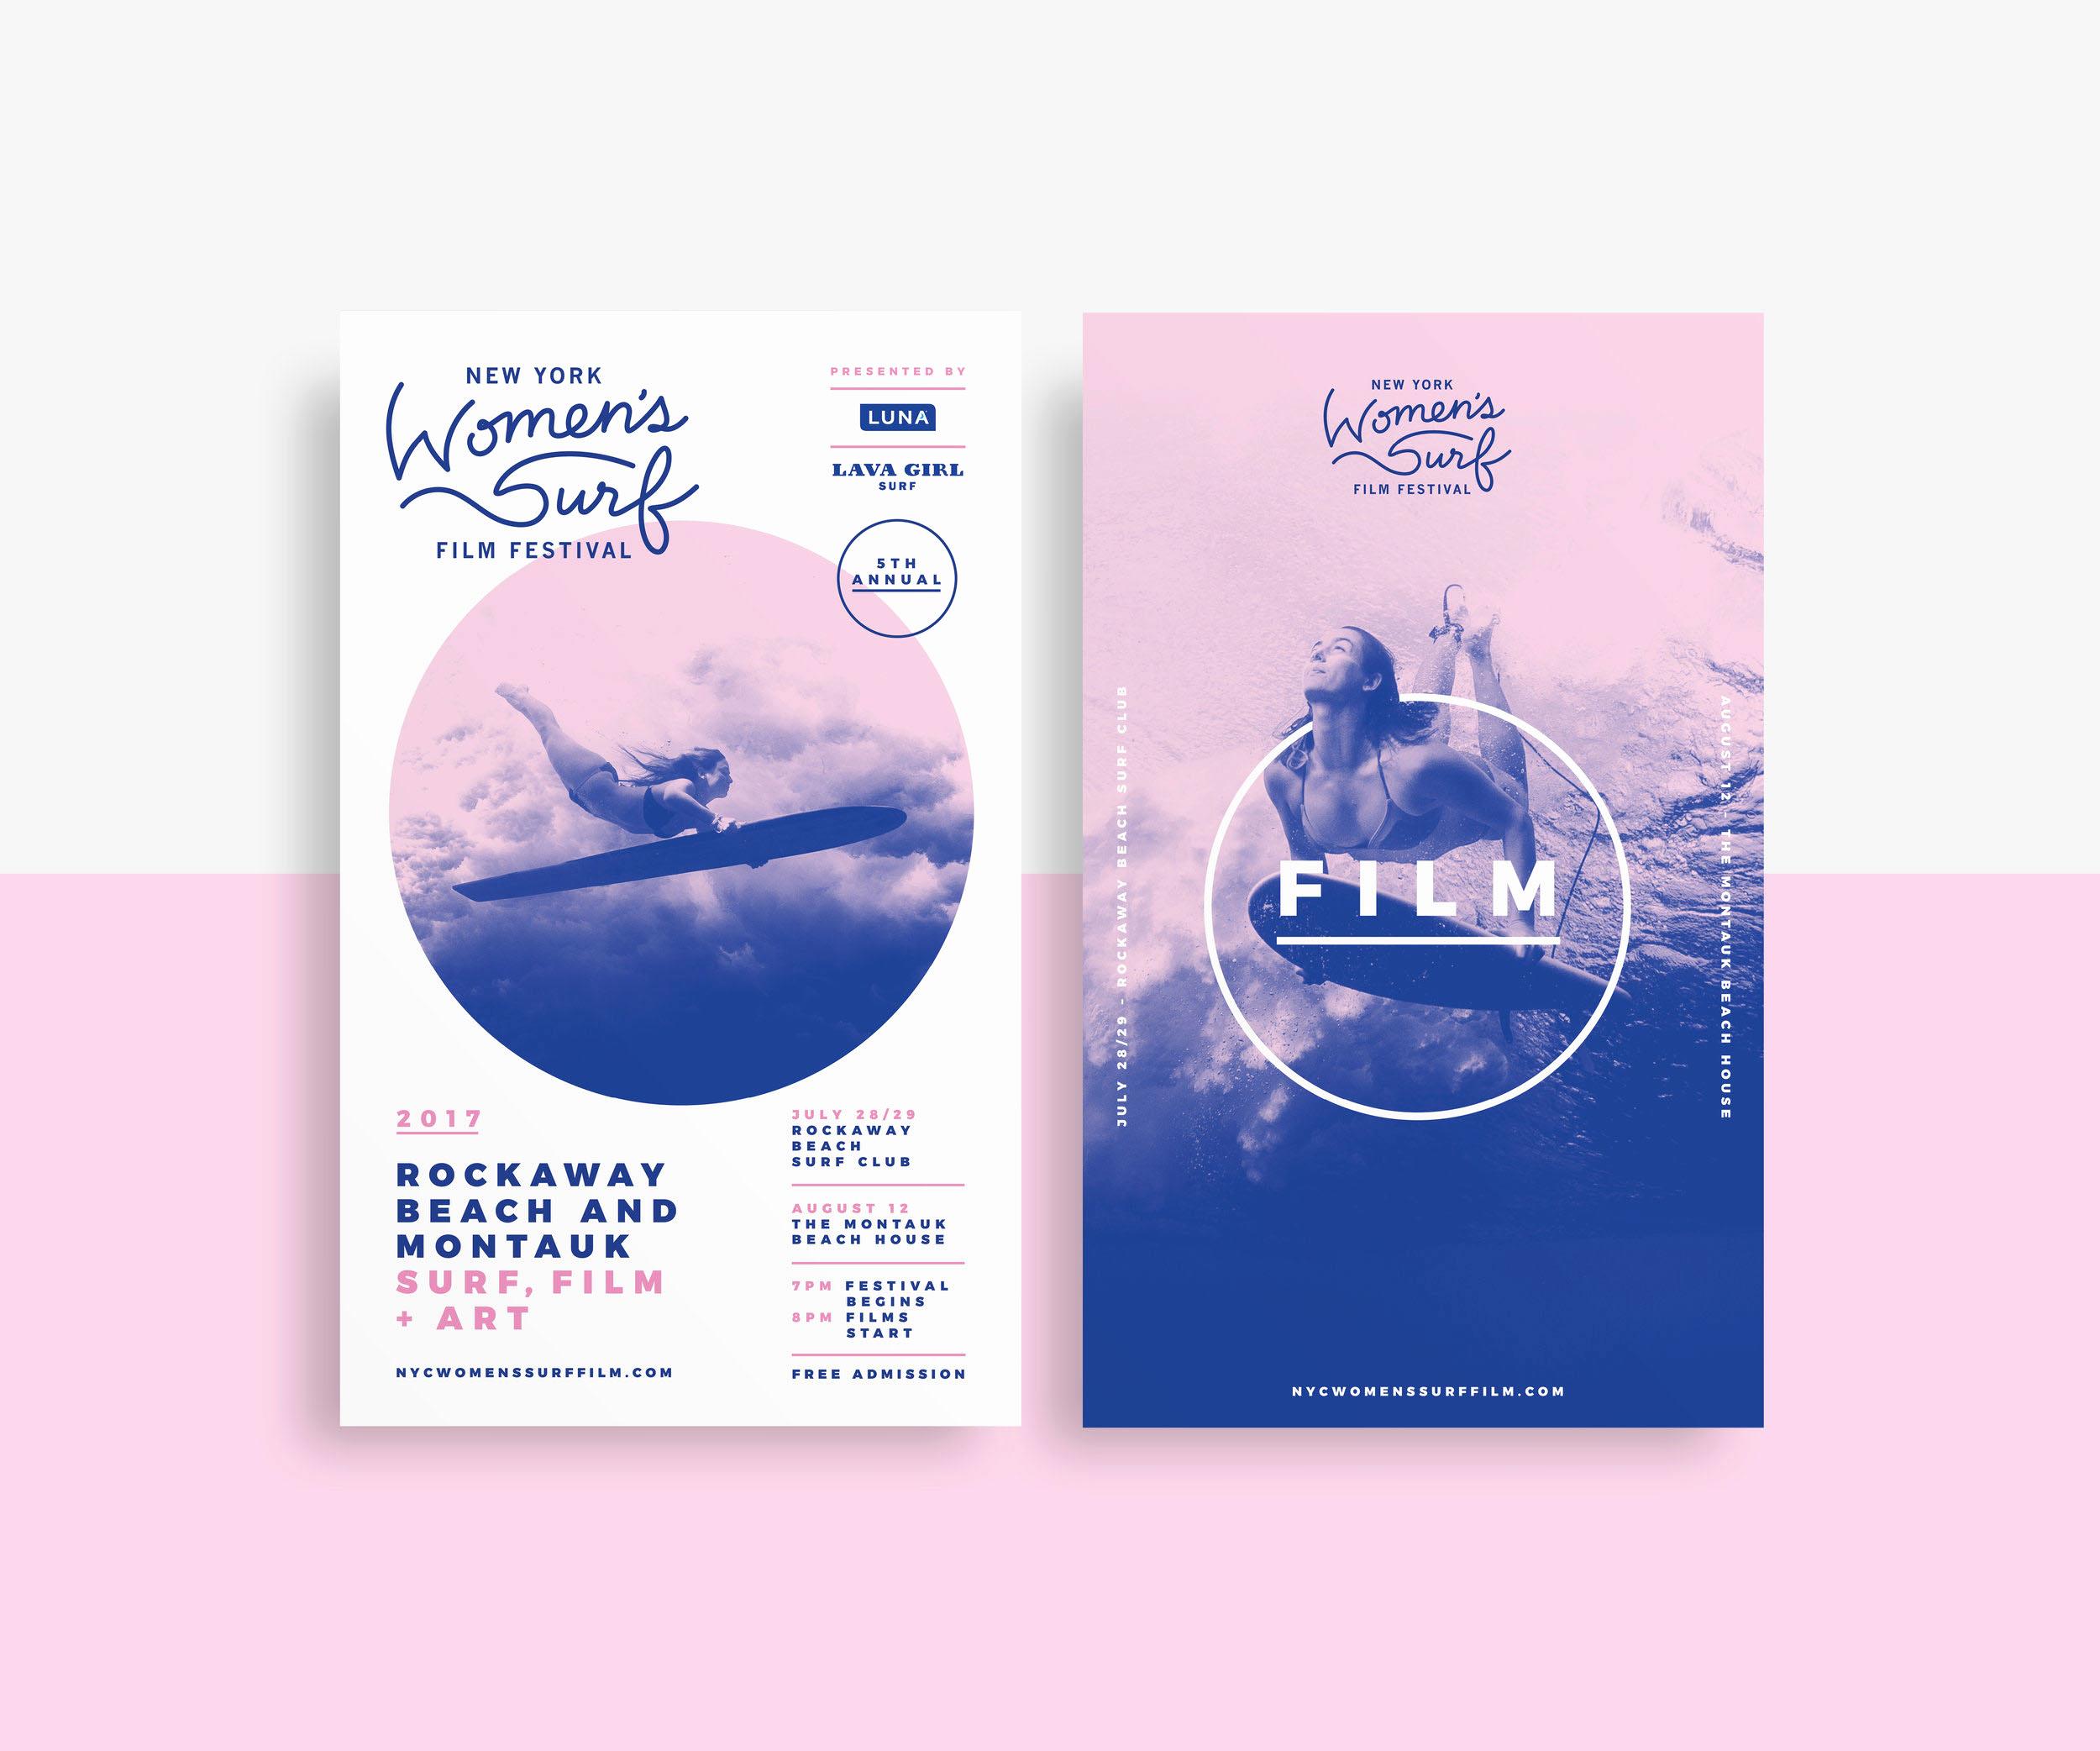 brand identity design nyc fresh brand identity new york women s surf festival of brand identity design nyc - Tendencias Diseño Gráfico 2019